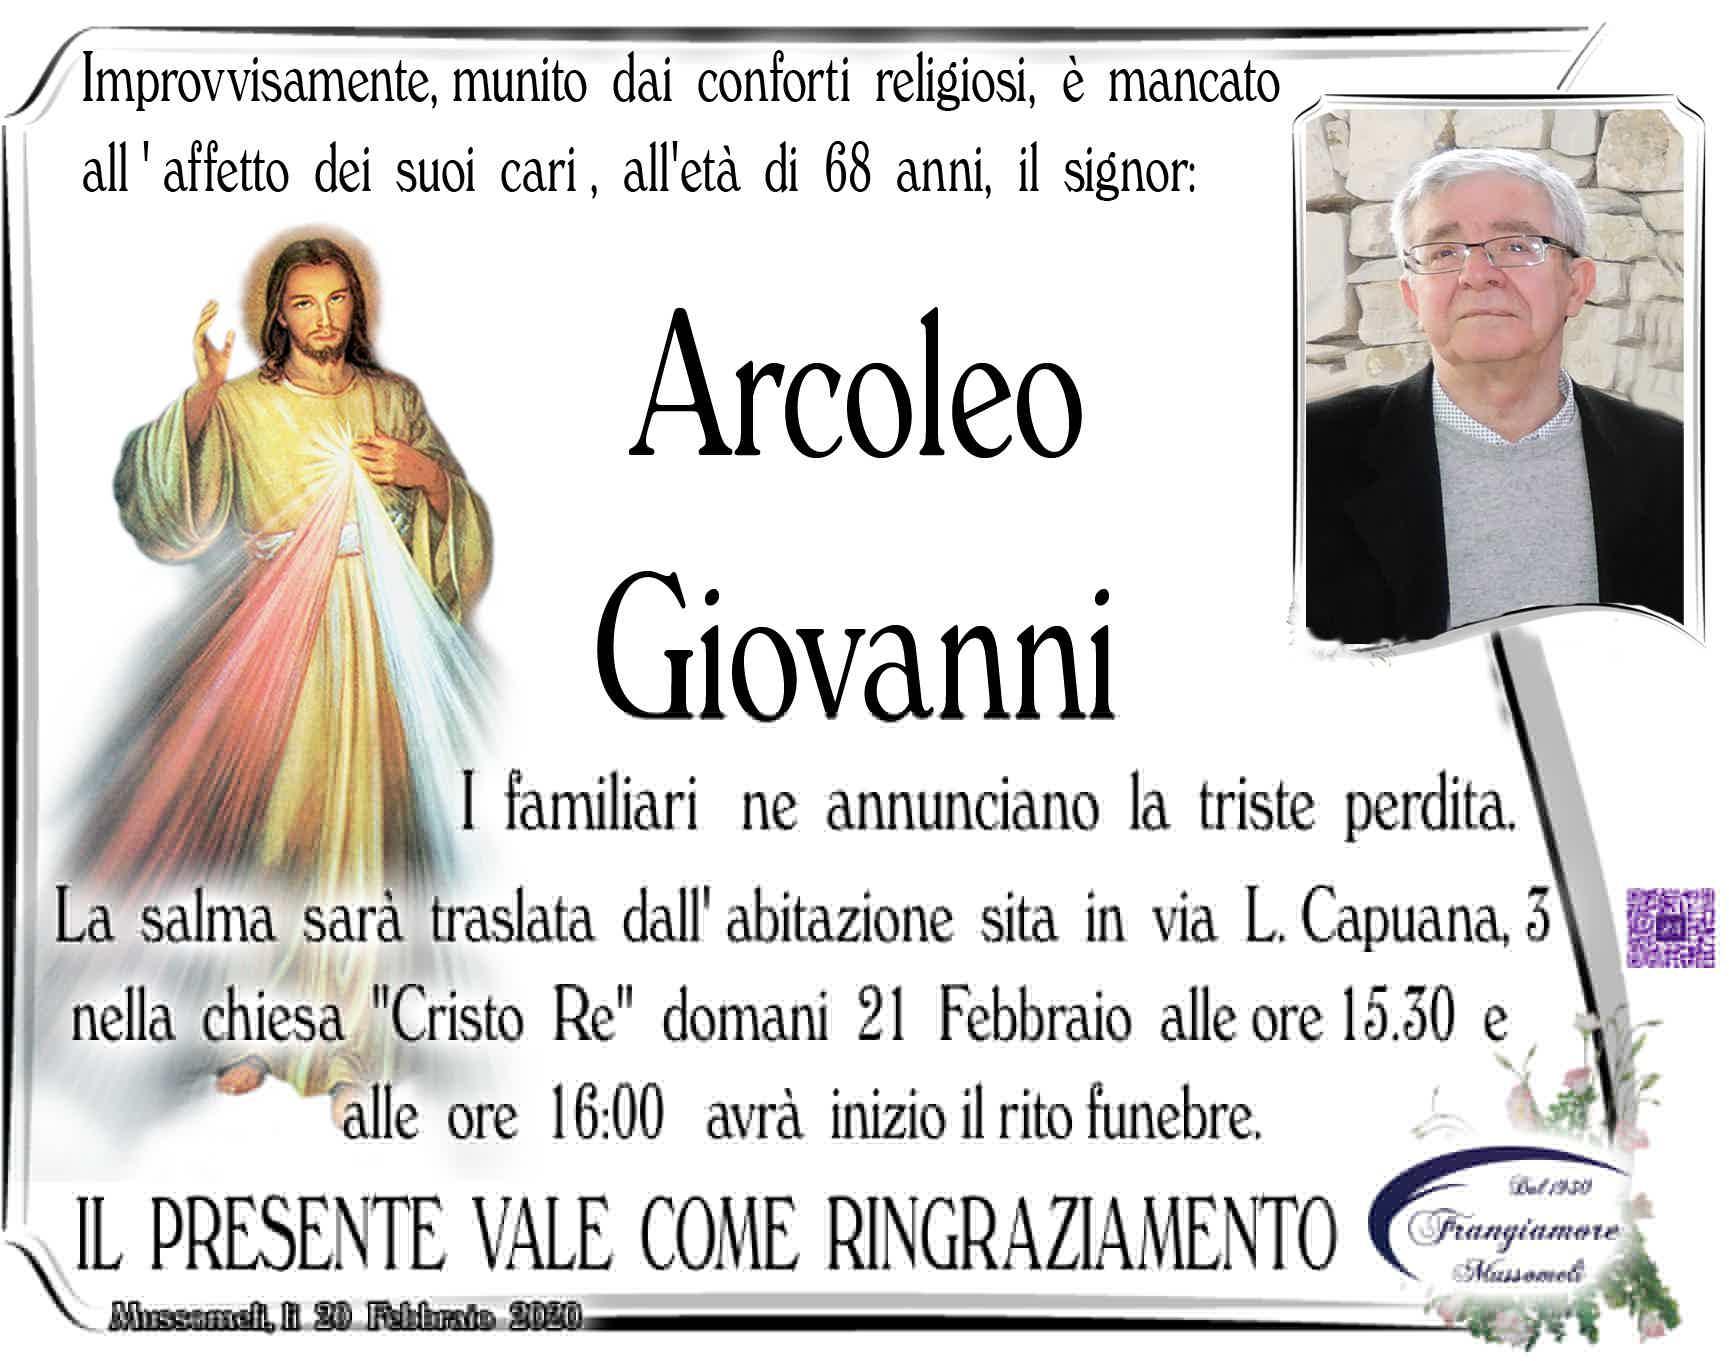 Giovanni Arcoleo